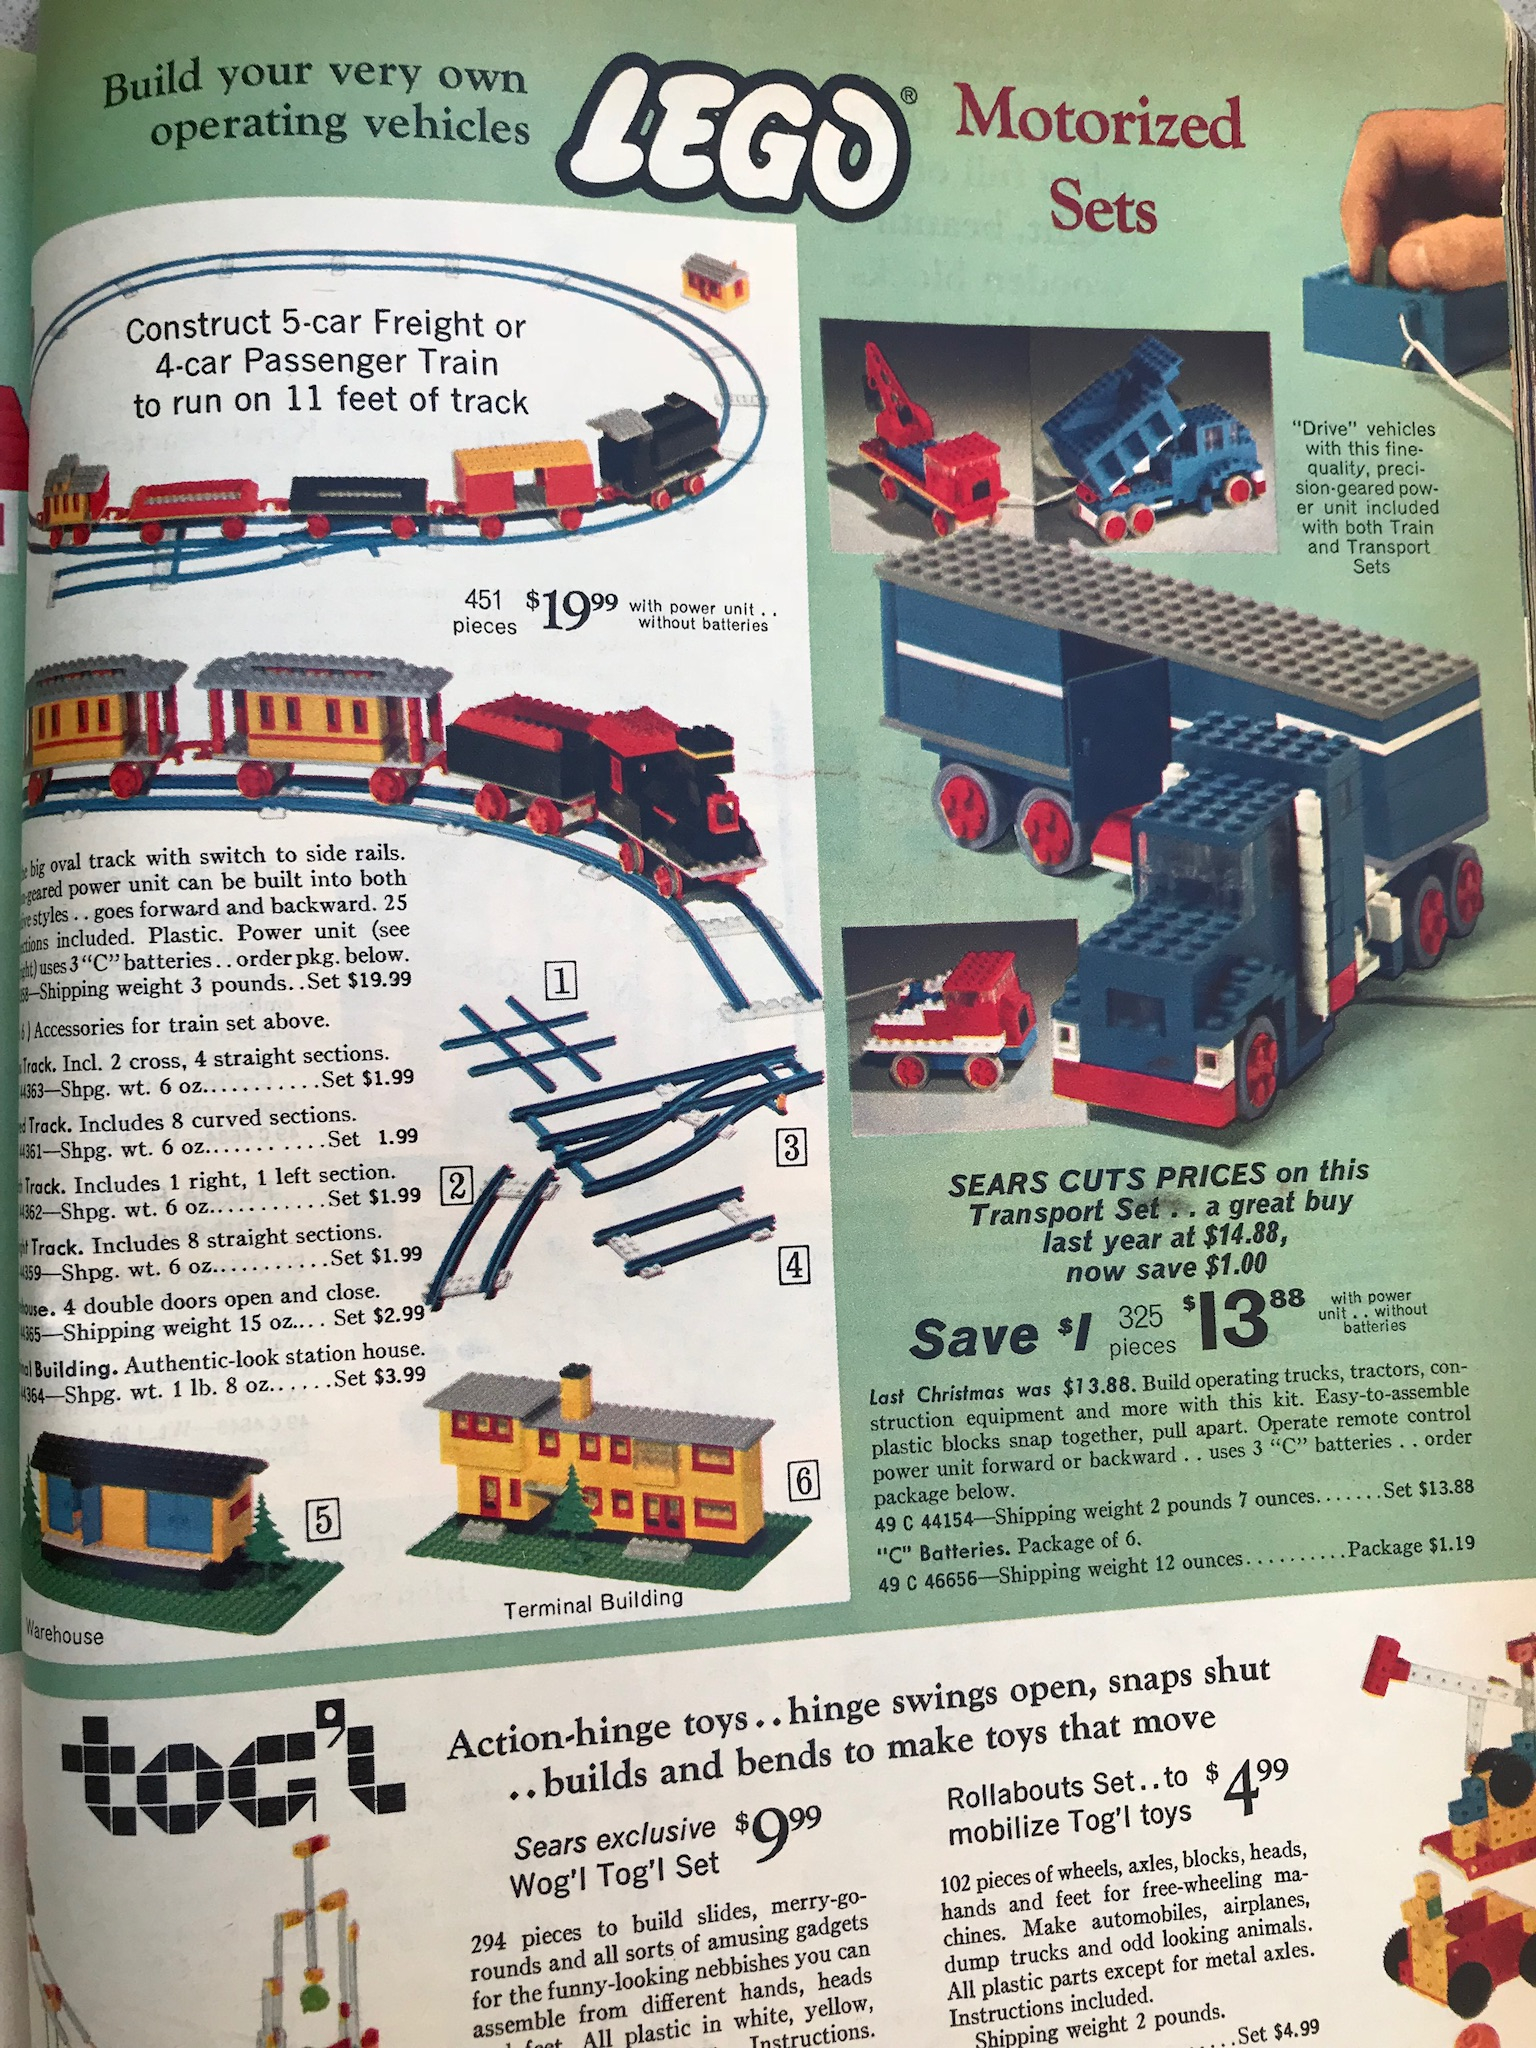 Sears Christmas Catalog.1969 Sears Christmas Catalog Lego Pages Brickset Forum